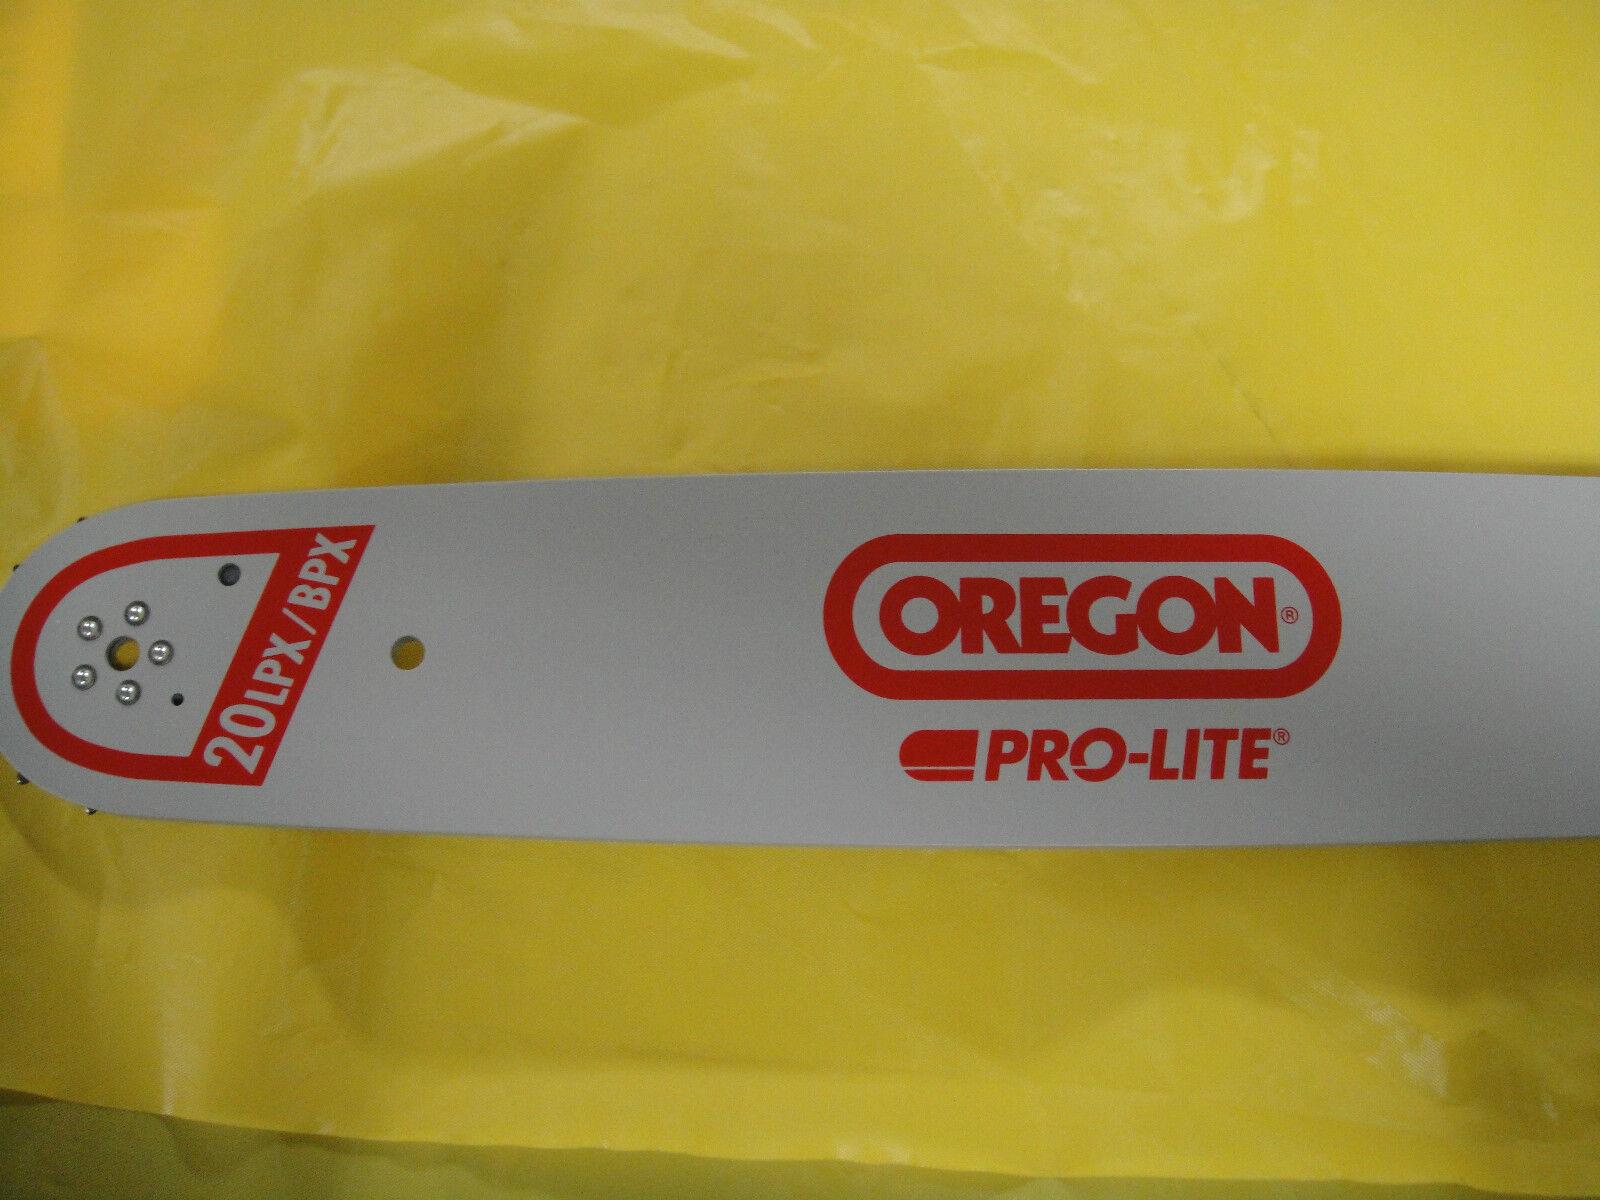 "Oregon 18"" Chain Saw Bar Echo Cs-400, Cs-440, Cs-3900, Cs-4000, Cs-4600"